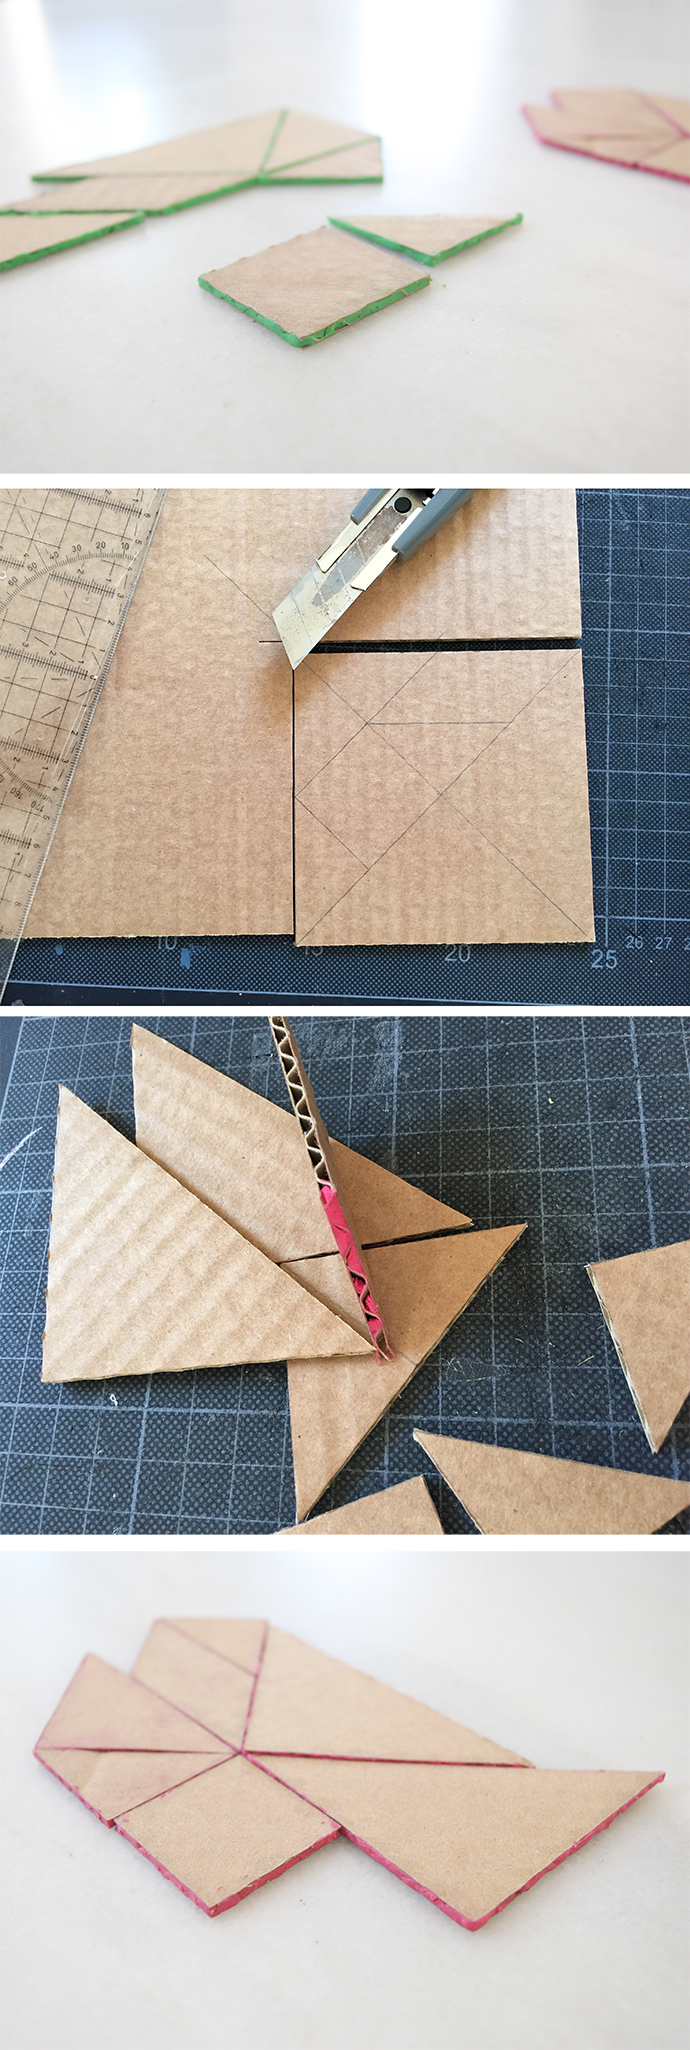 tangram cardboard karton carton ninos kids kinder selber machen basteln do it yourself fun